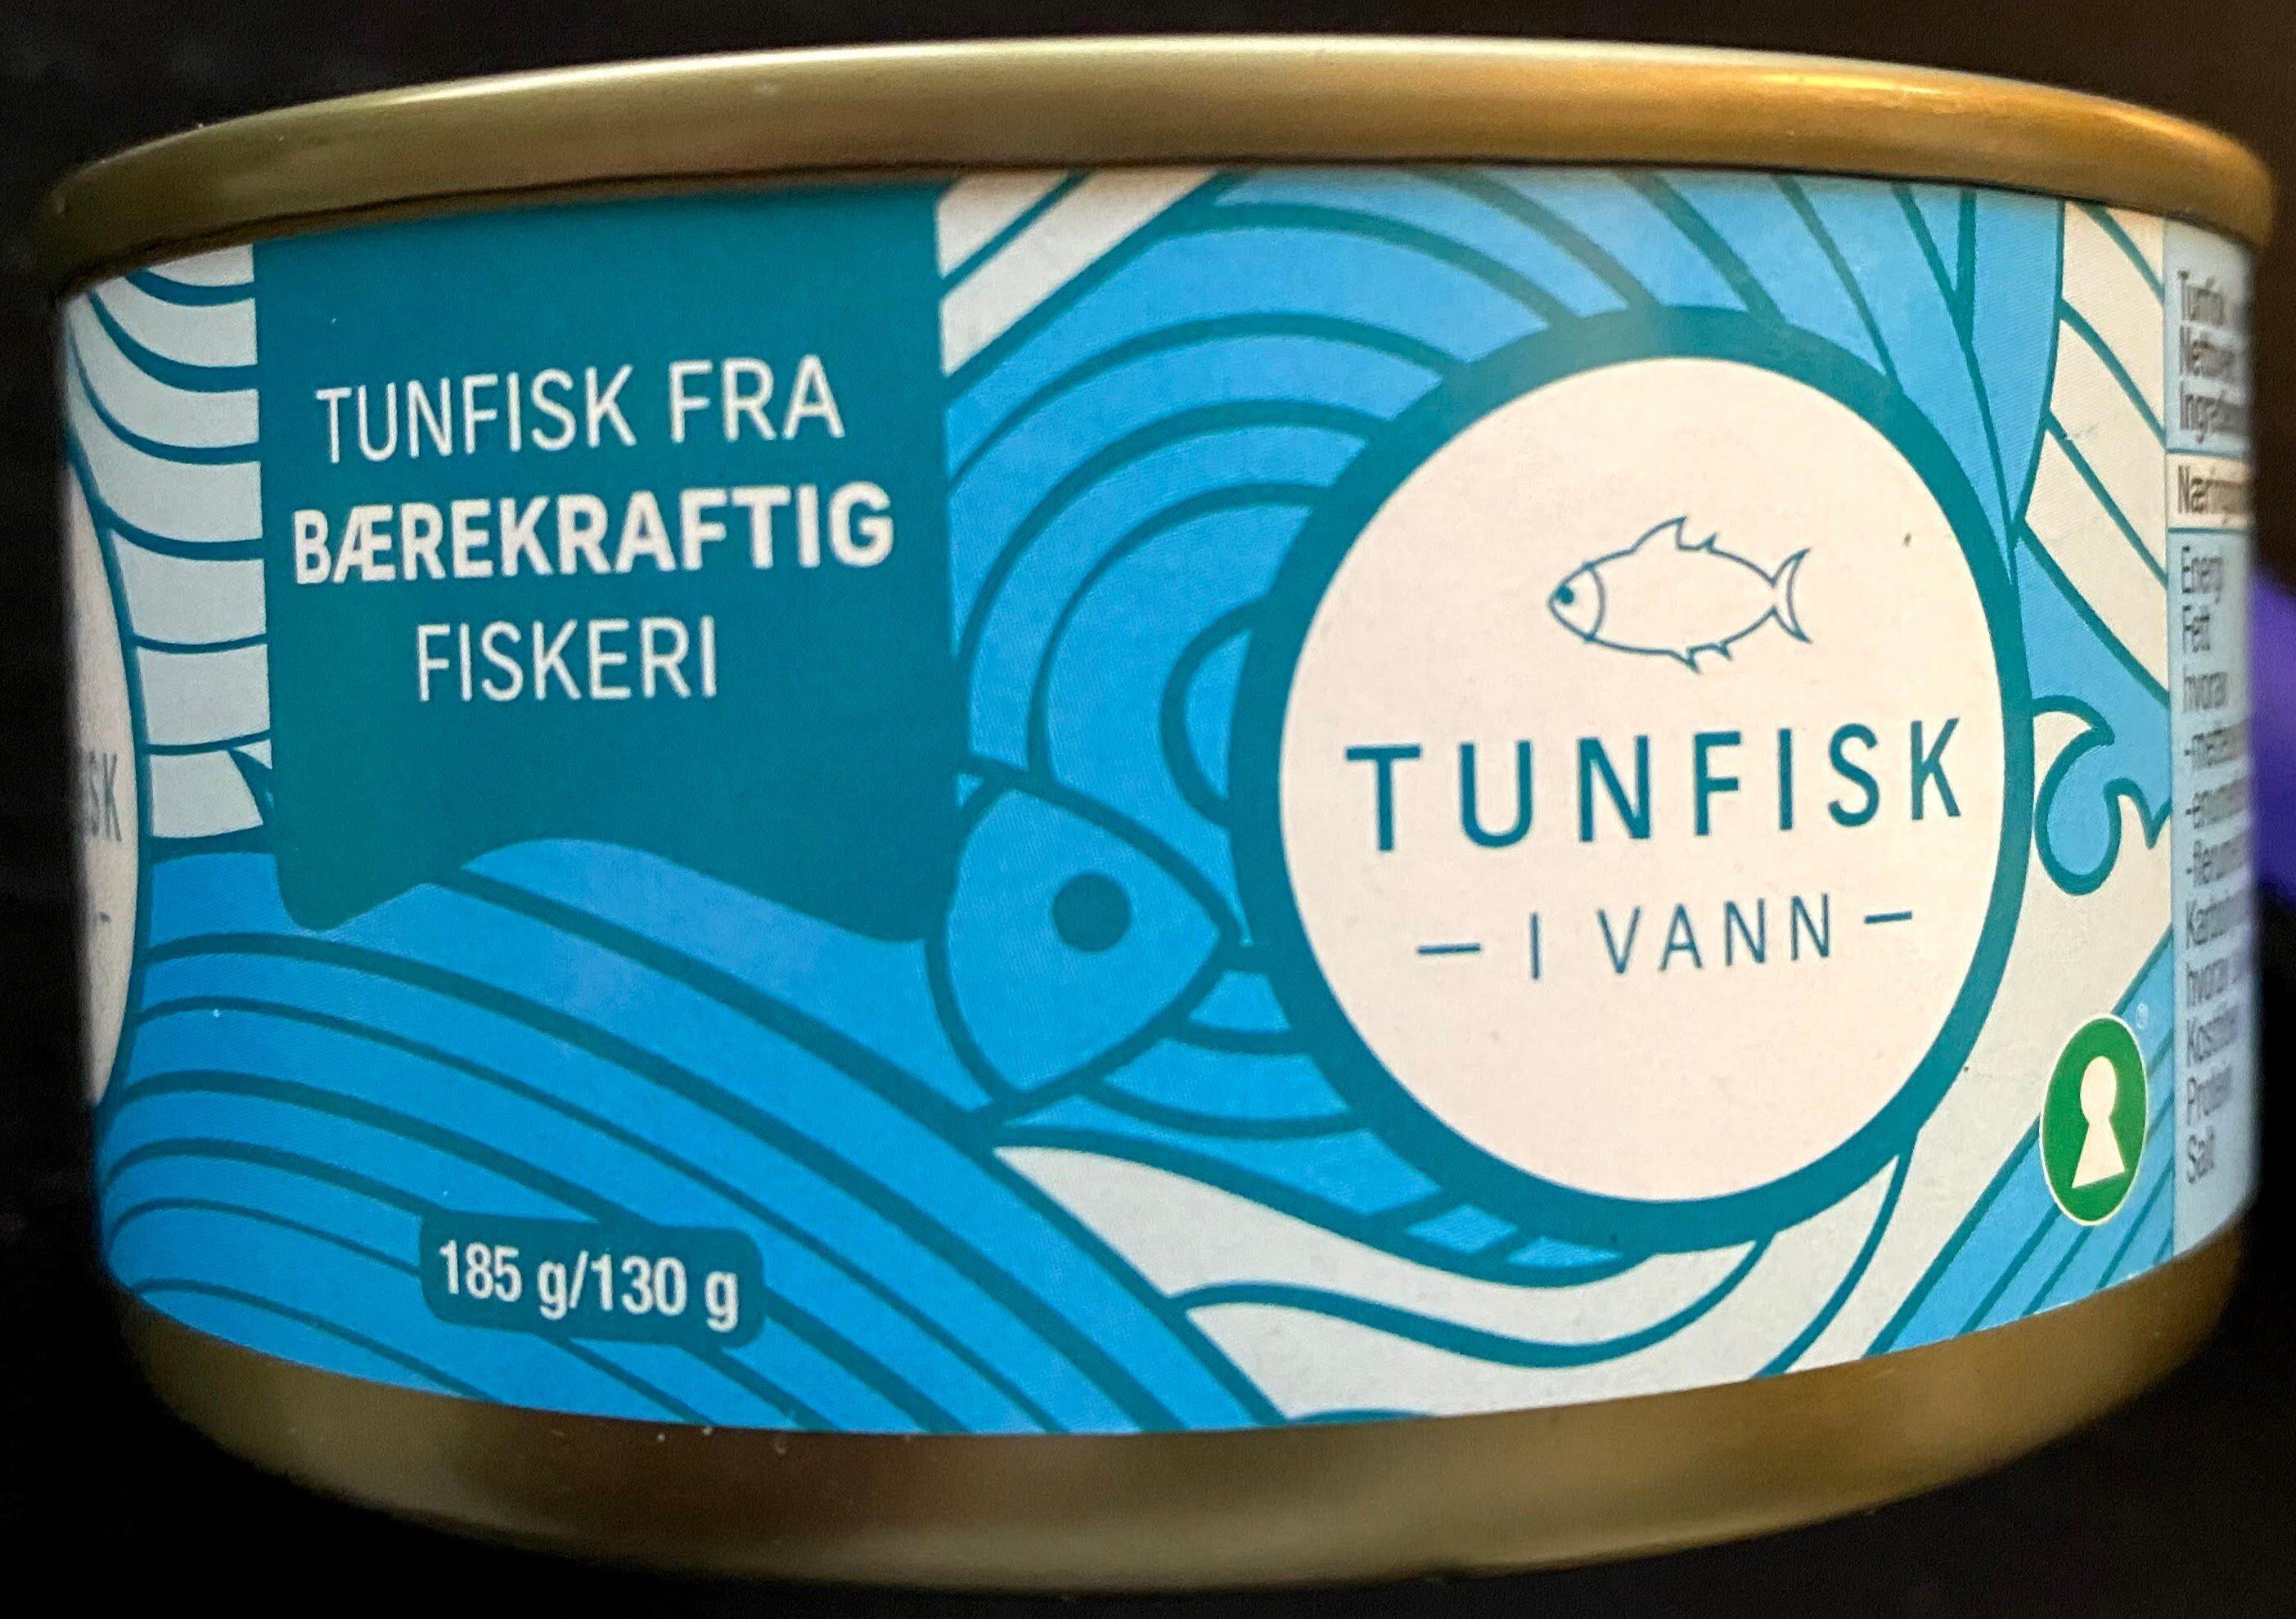 REMA 1000 Tunfisk i Vann - Prodotto - no